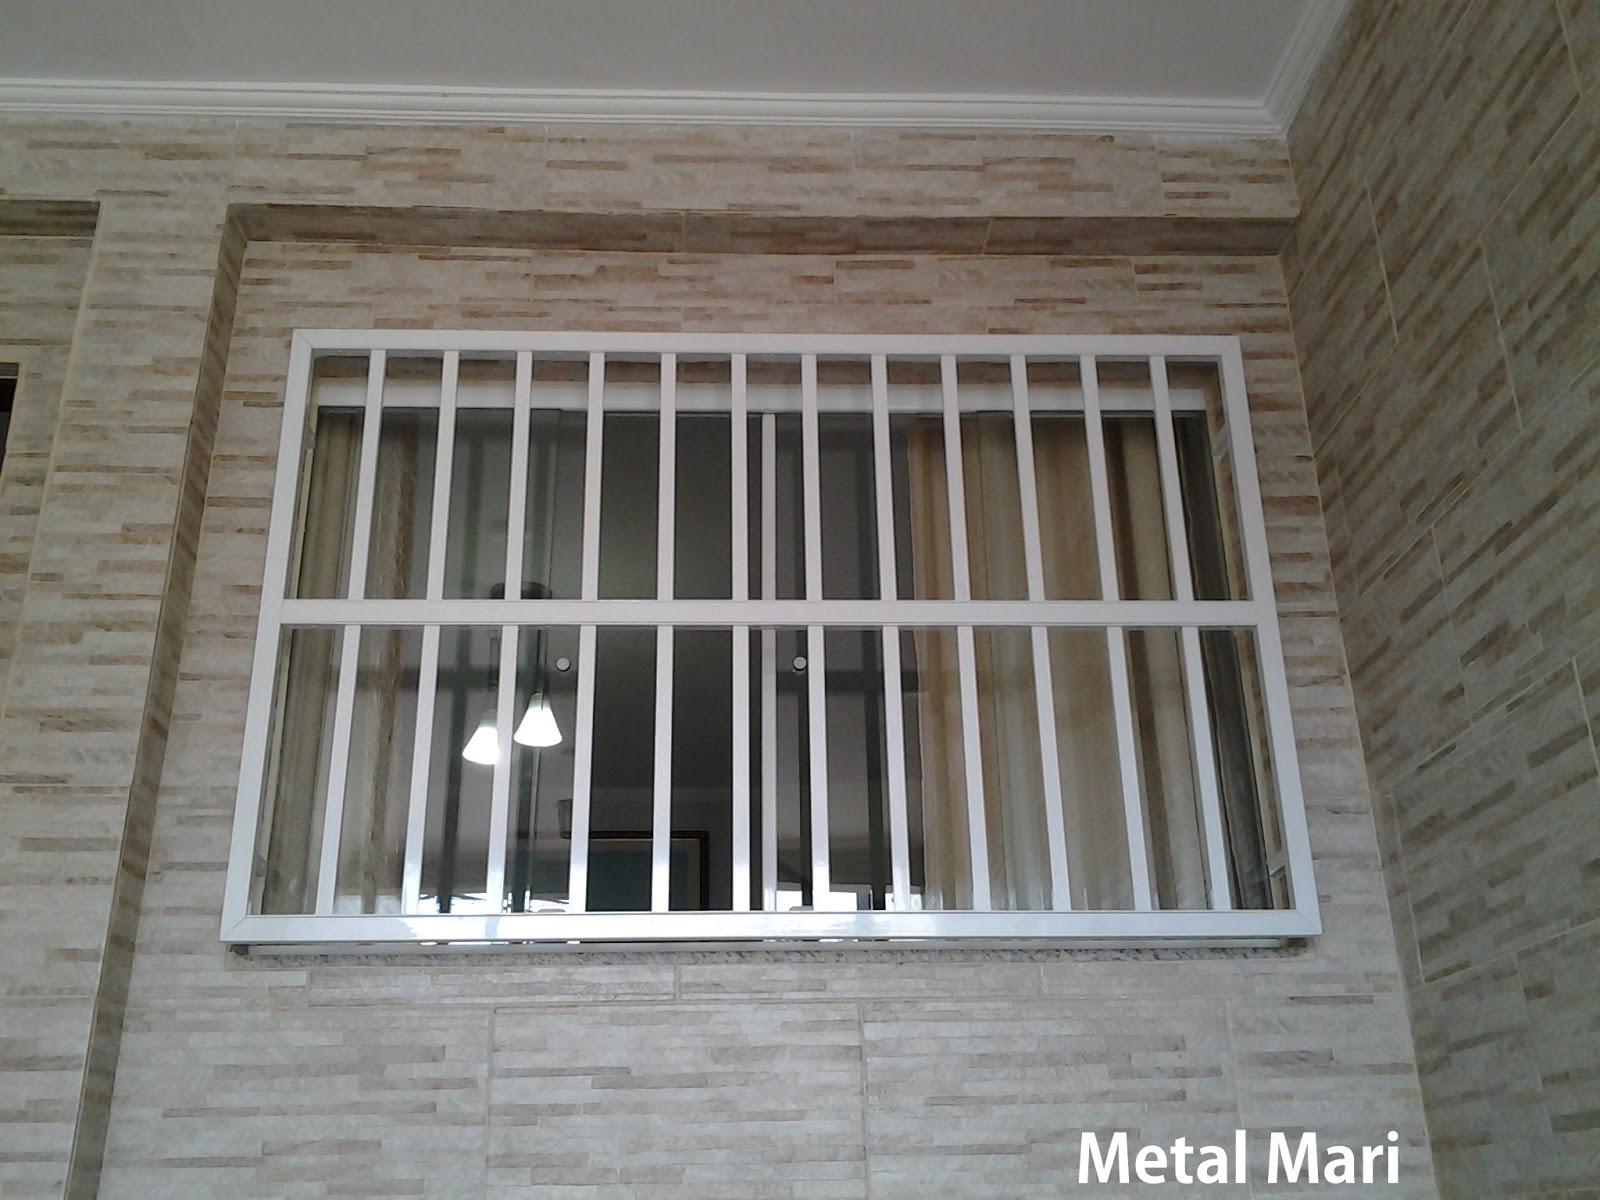 #5A5042 Metal Mari Esquadrias : Grade de alumínio branco (Metal Mari) 4136 Grade De Ferro Para Janela De Aluminio